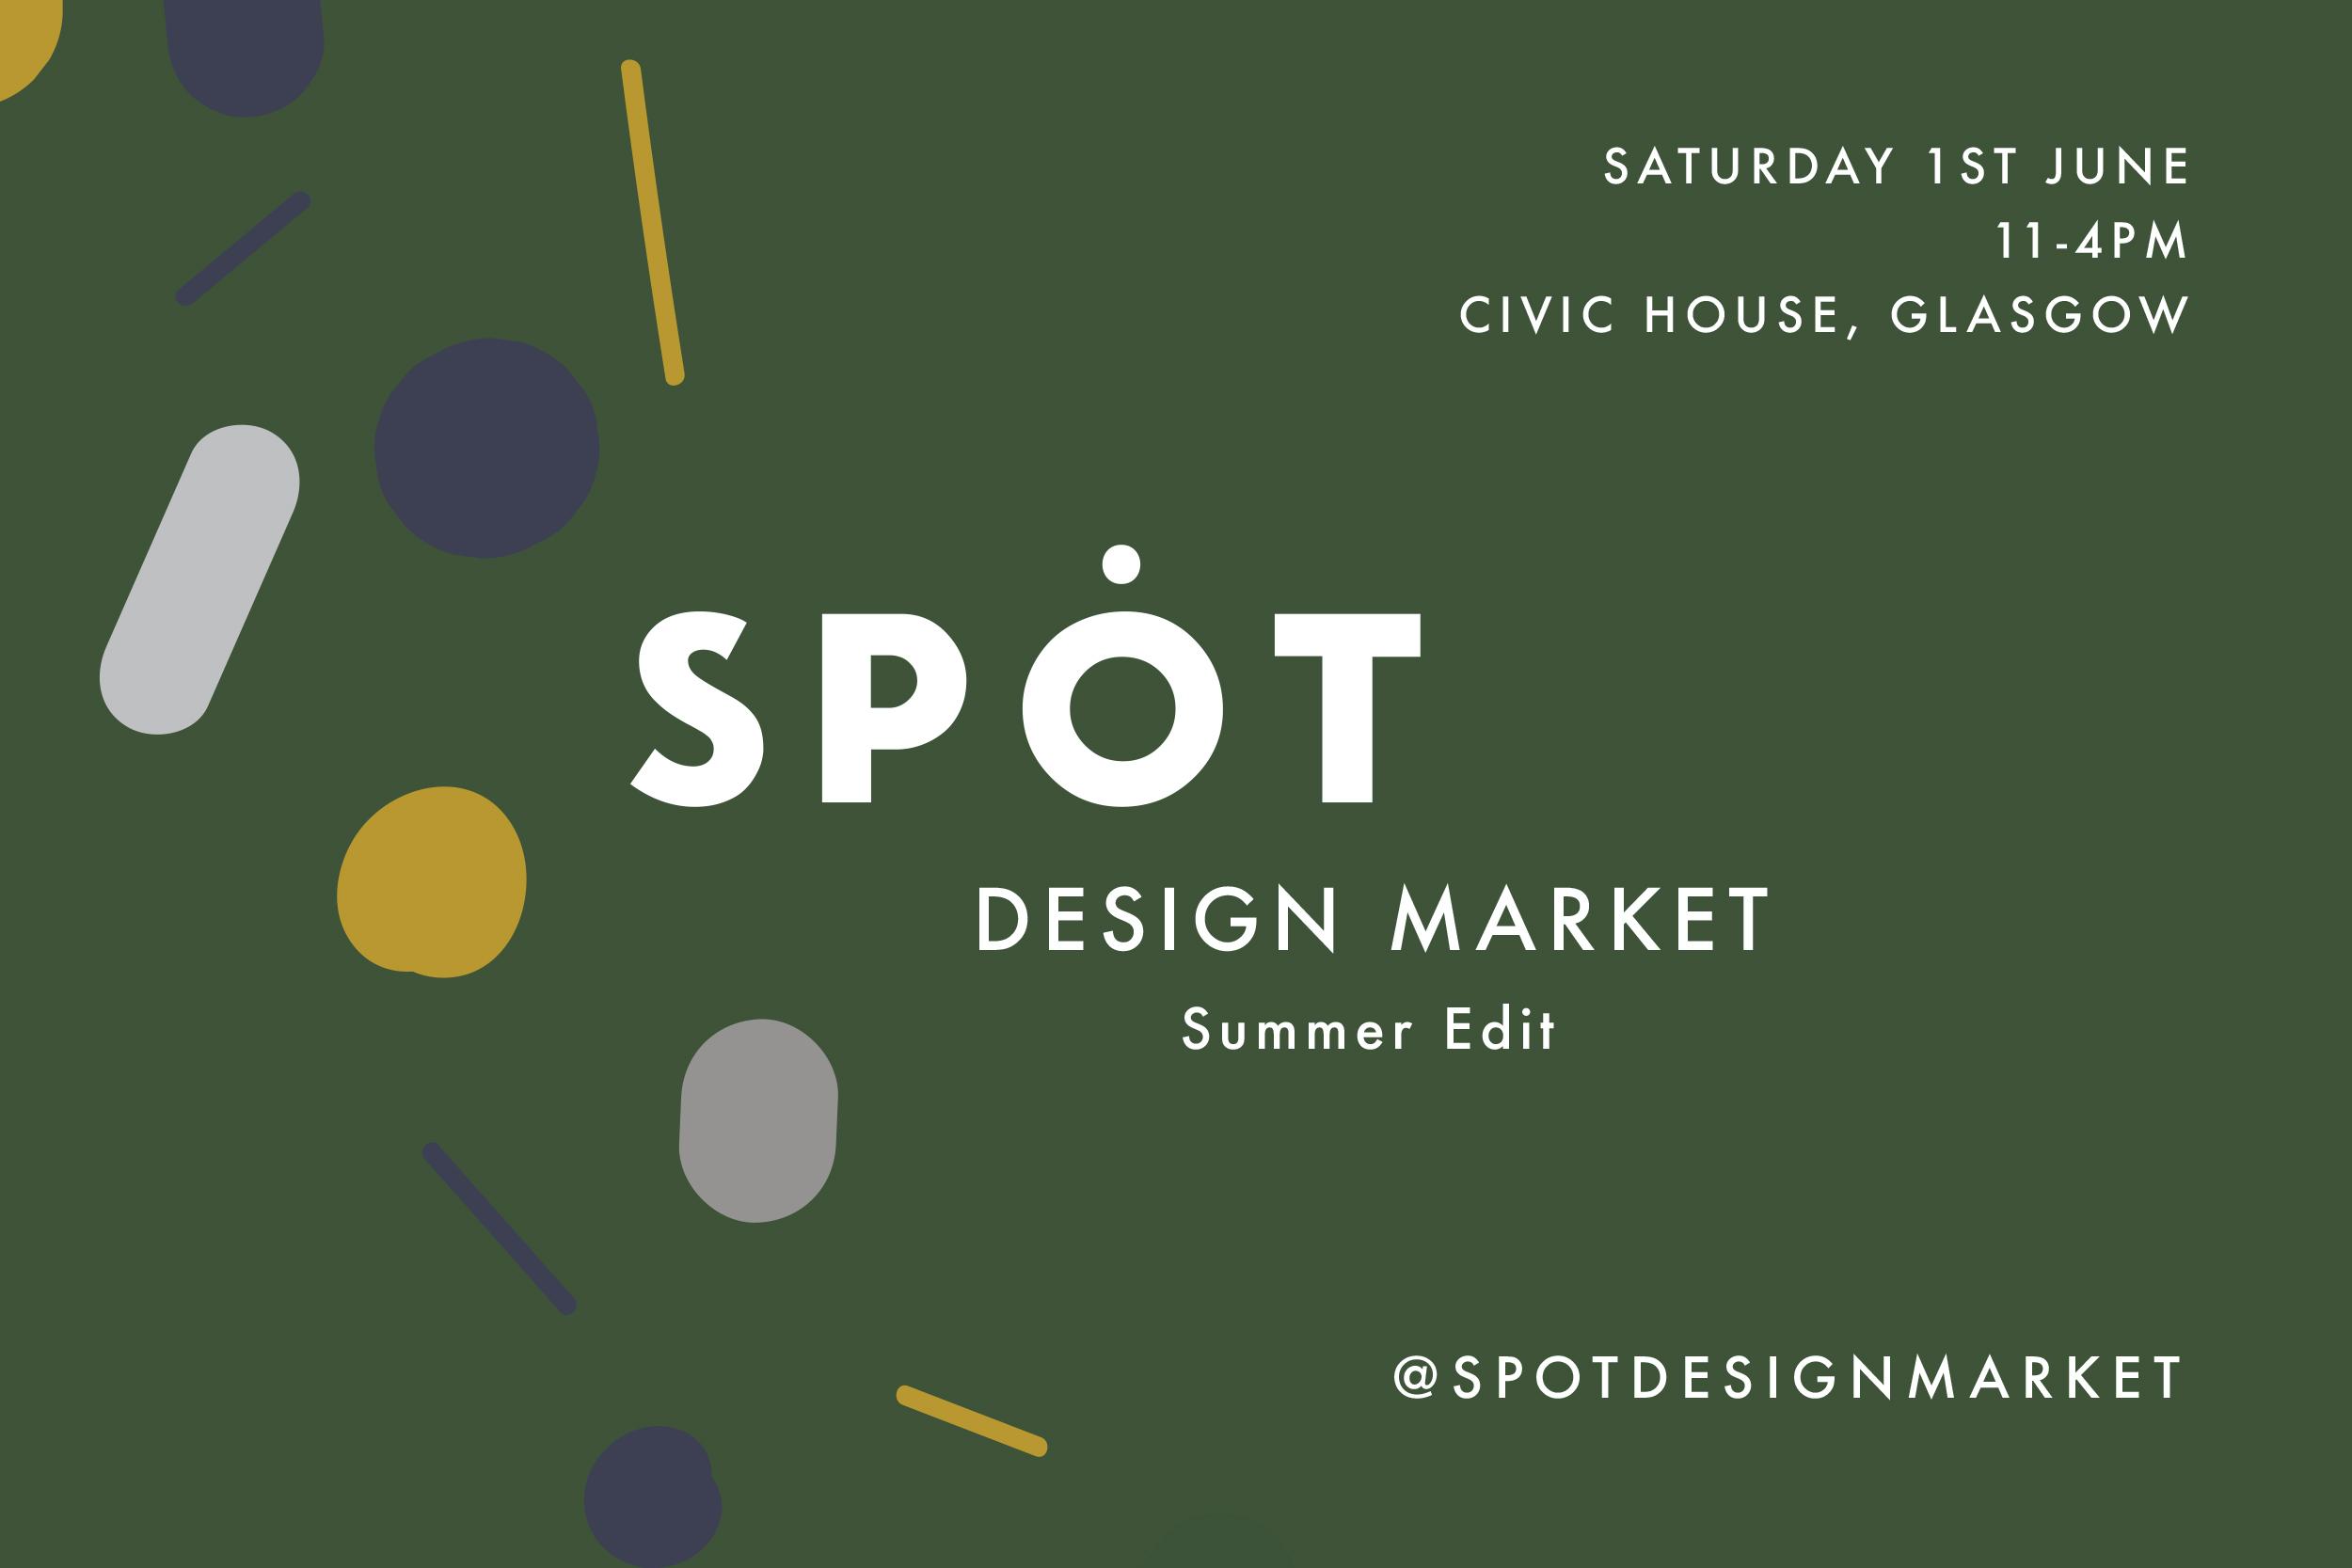 Spot Design Market: Summer Edit